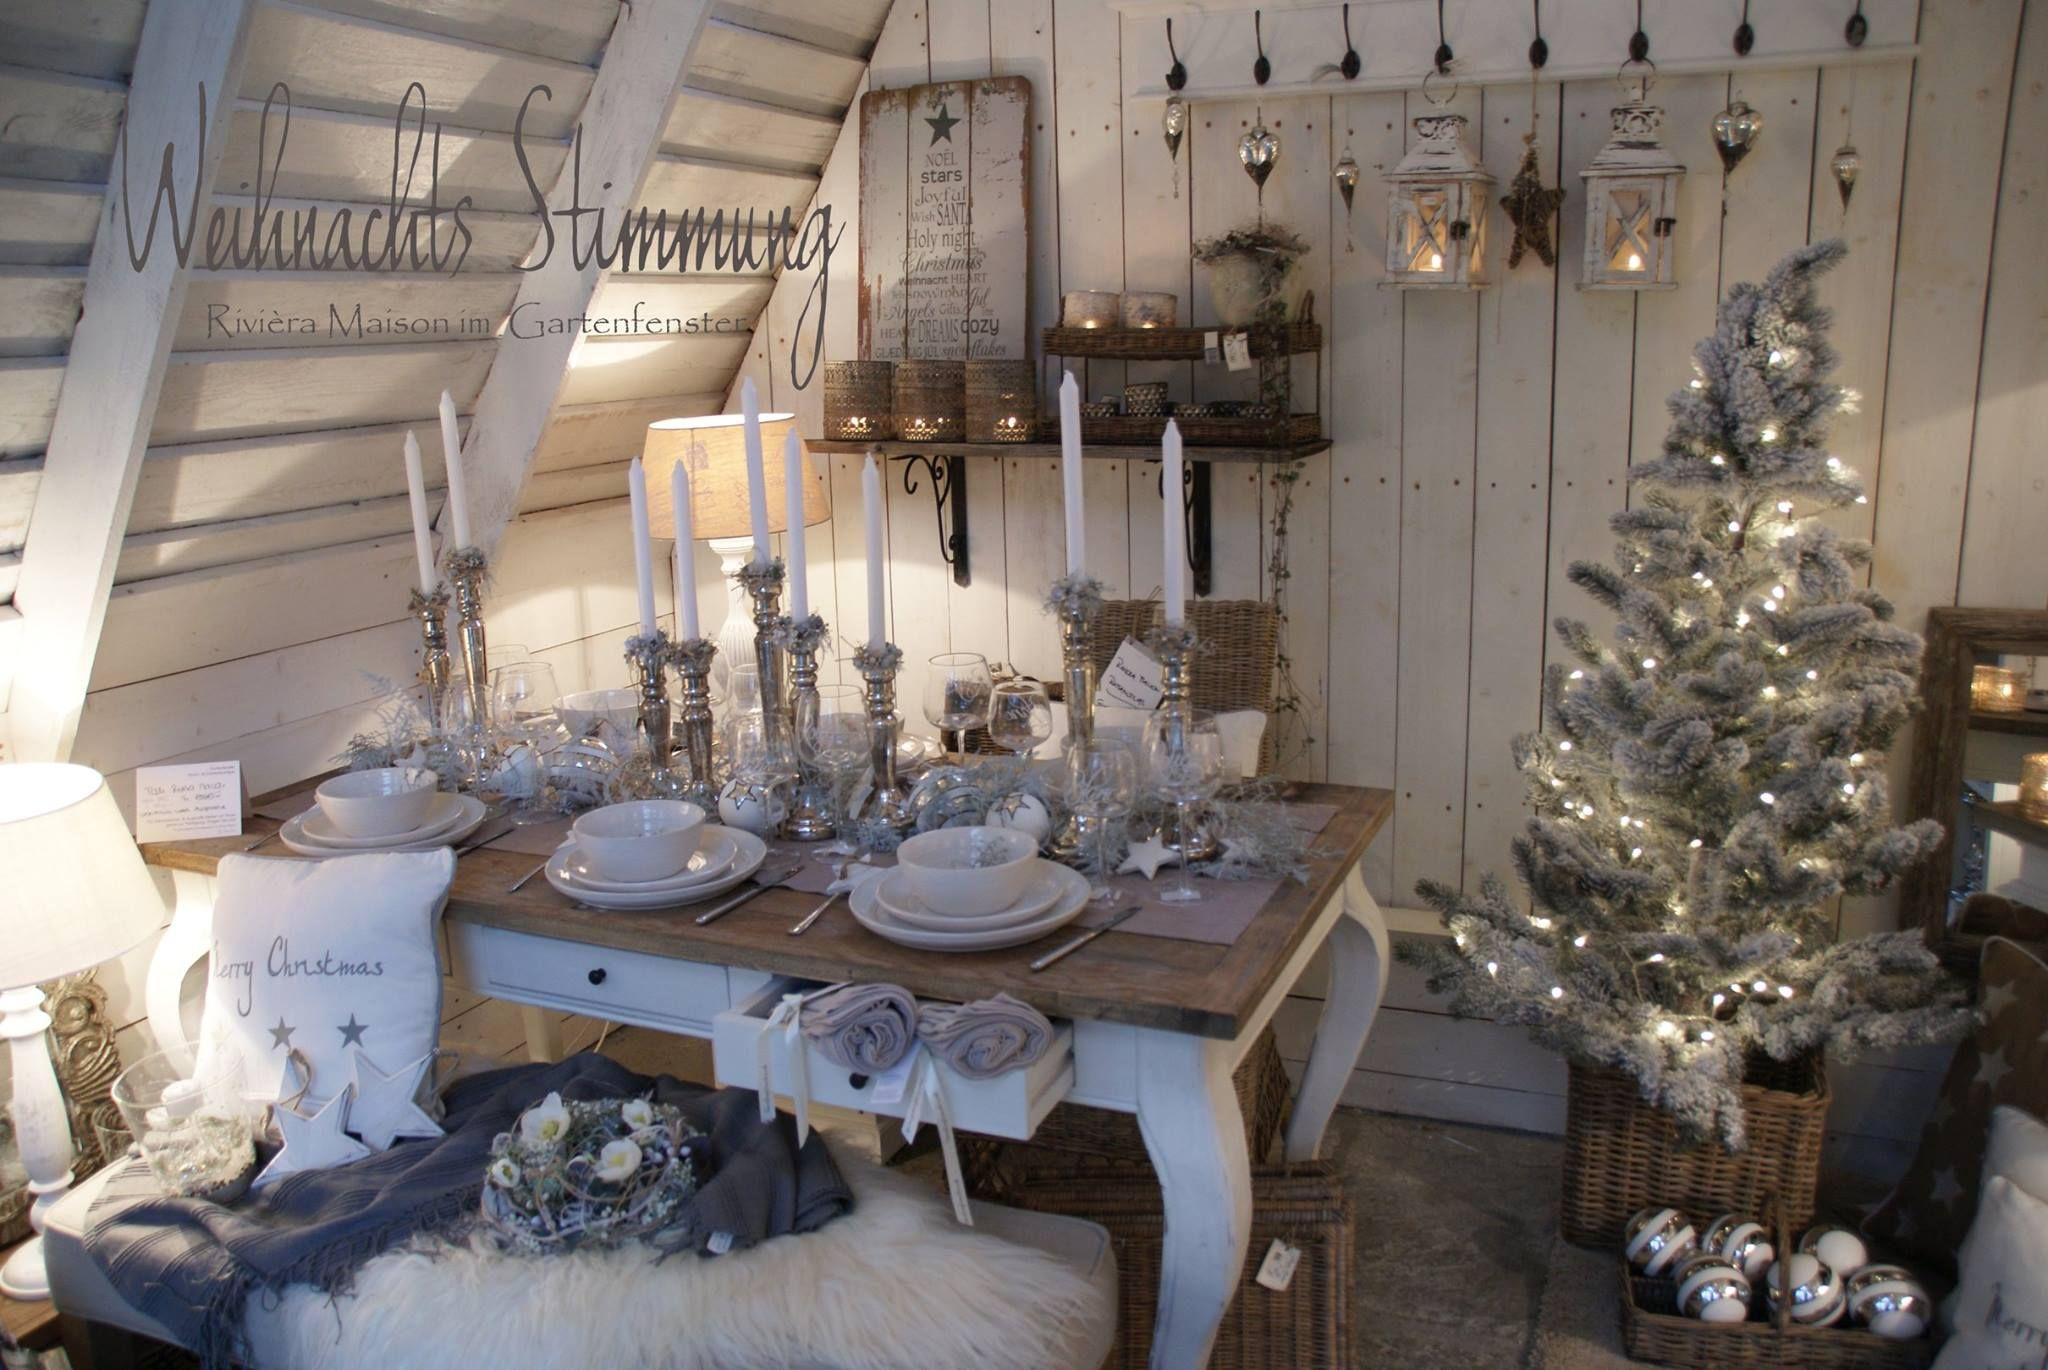 Shabby Chic Natale : Il natale di rivièra maison nel gartenfenster cottage christmas